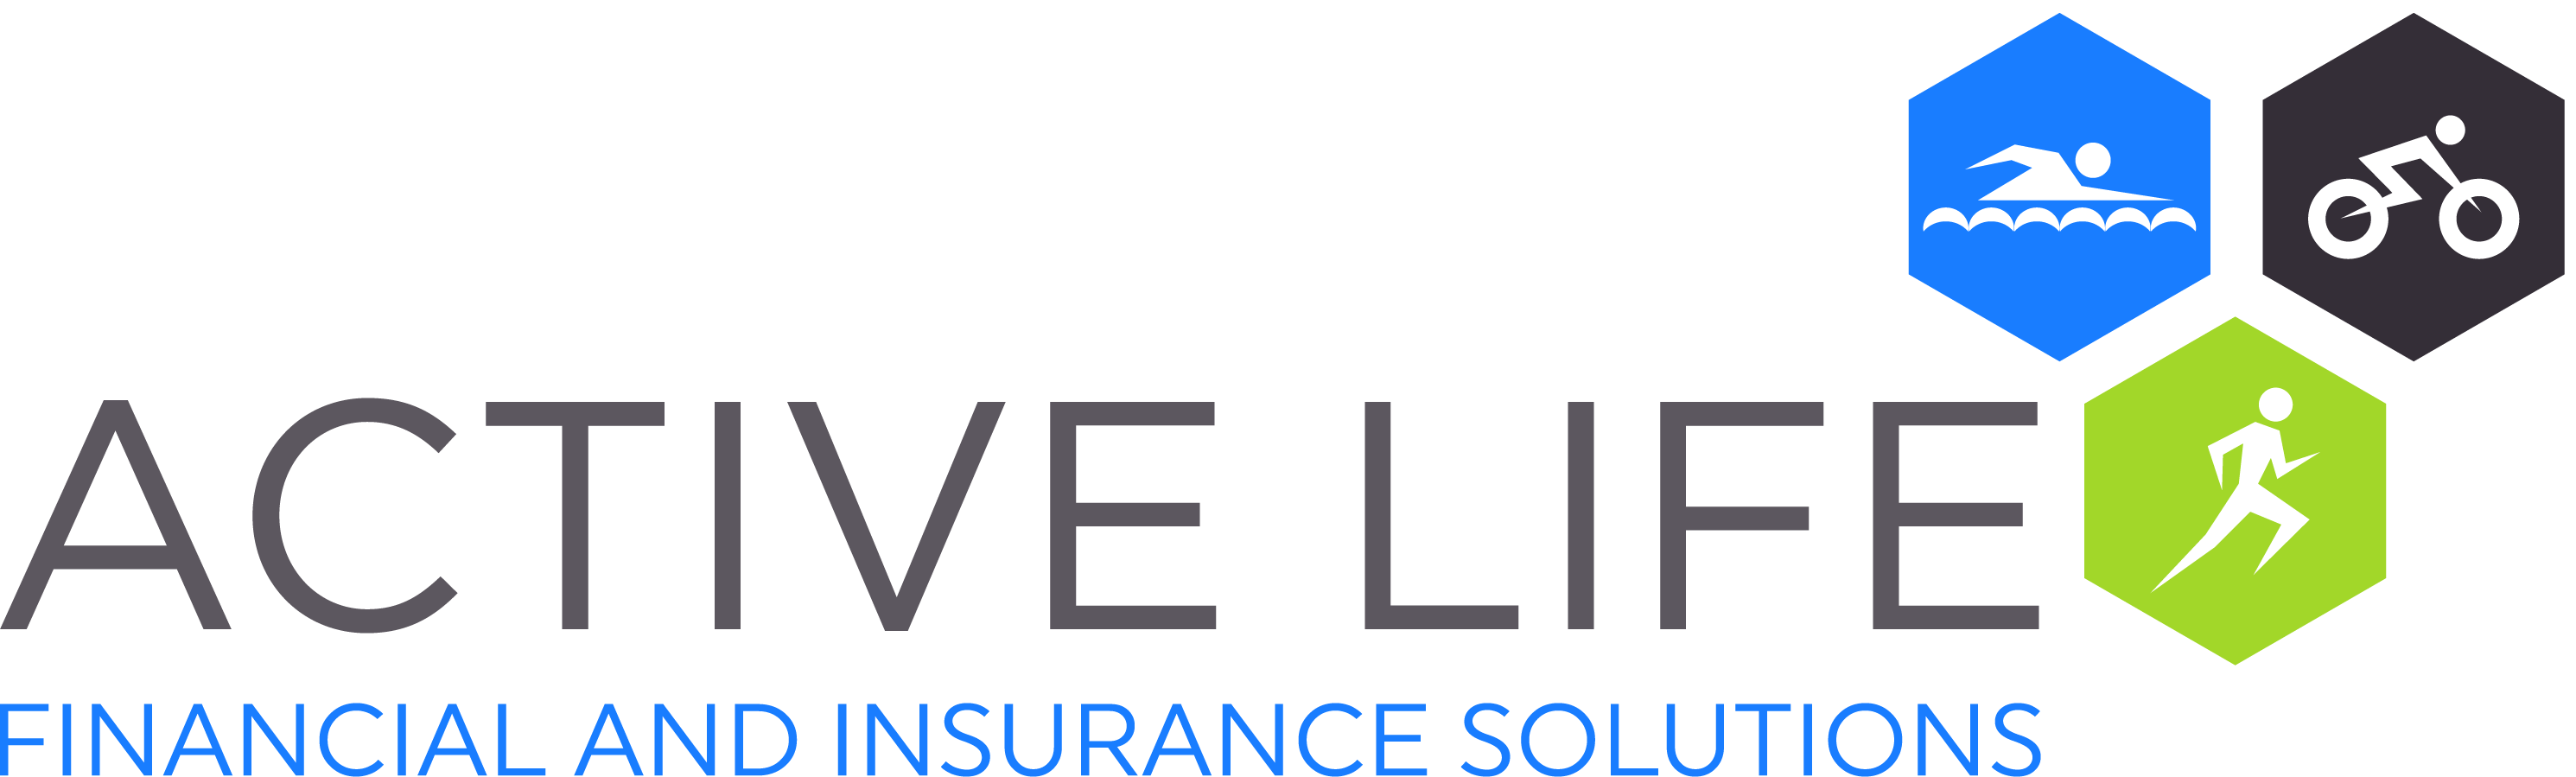 EDWARD GONZALEZ  Your Registered Representative & Insurance Agent